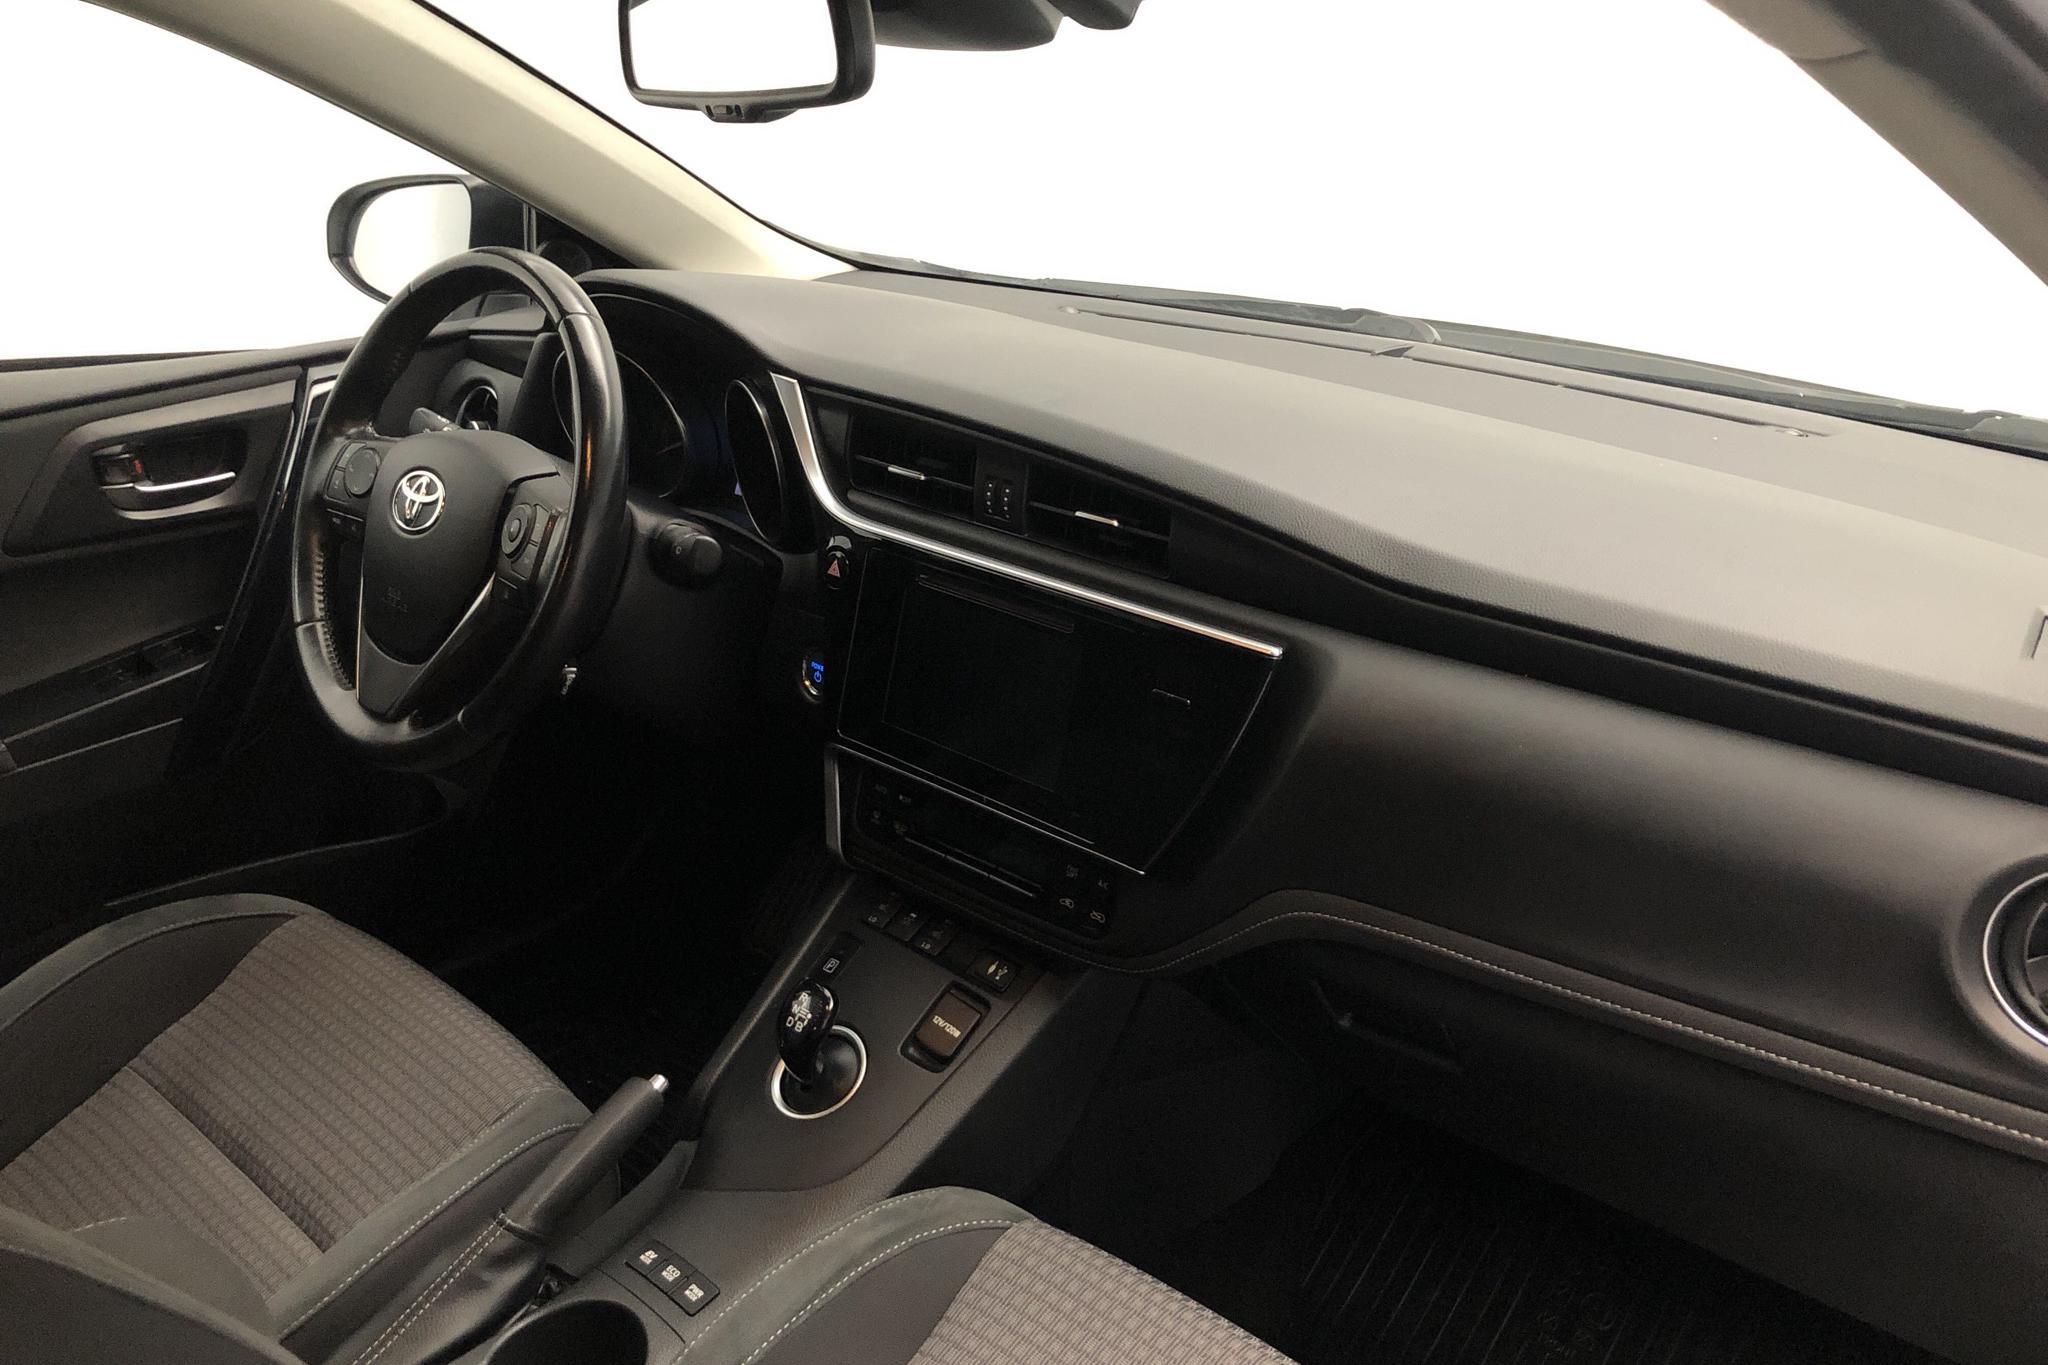 Toyota Auris 1.8 HSD Touring Sports (99hk) - 10 735 mil - Automat - vit - 2018